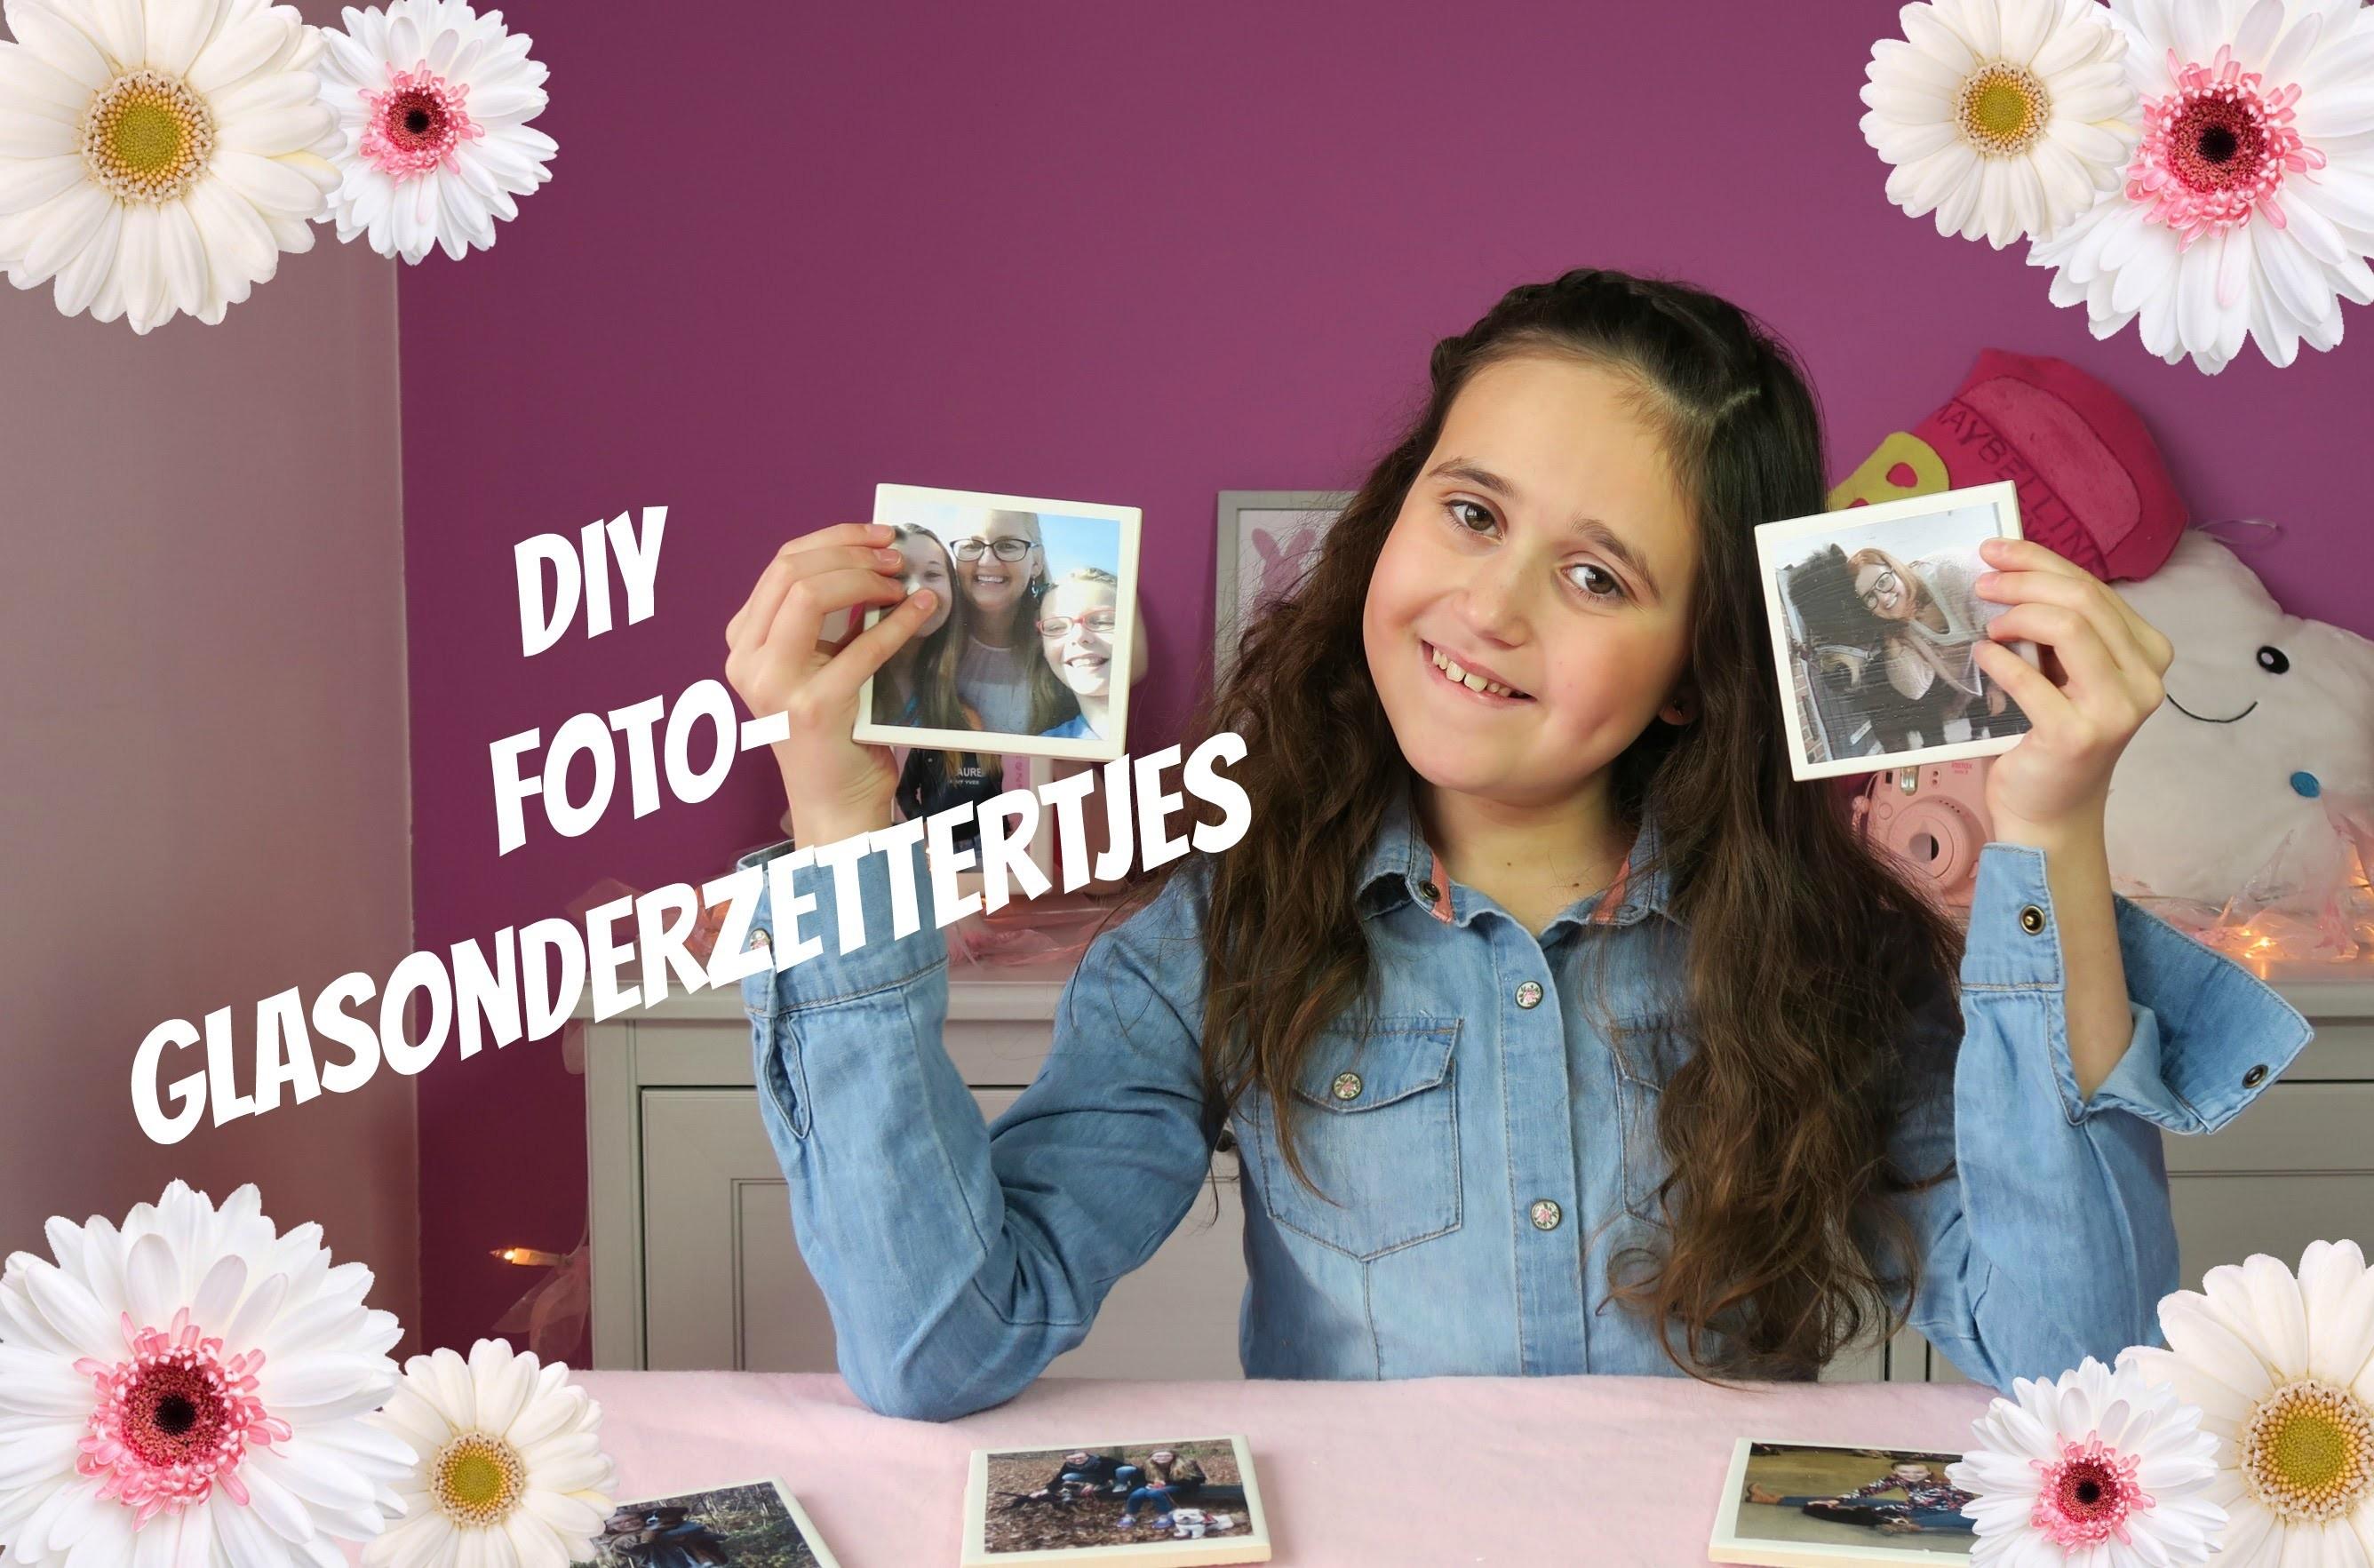 DIY foto-glas-onderzettertjes